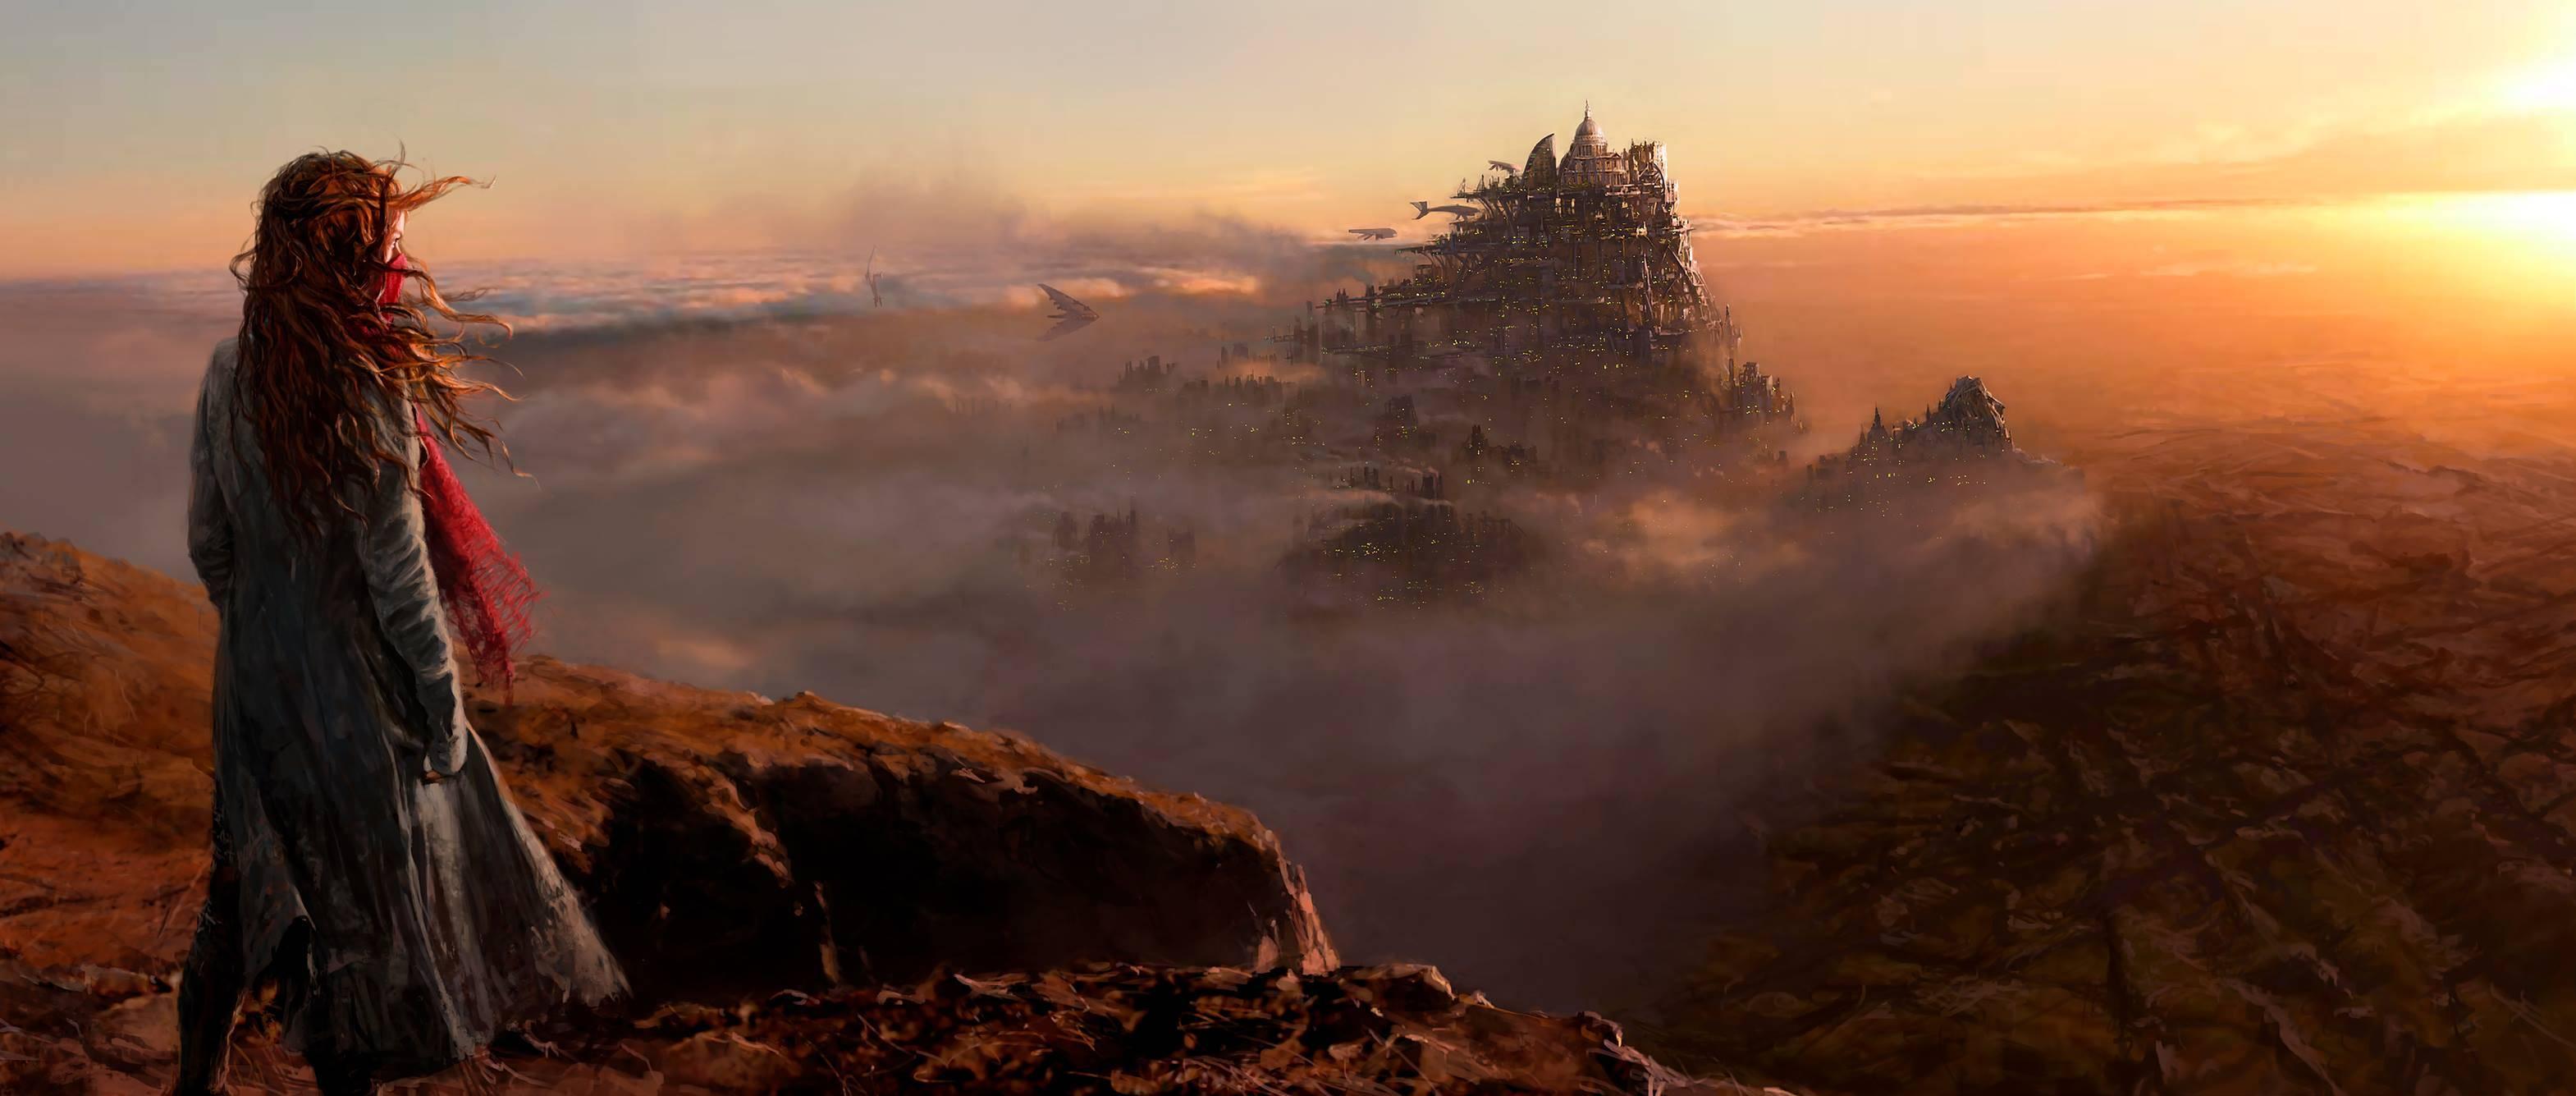 Mortal Engines: Peter Jacksons neues Sci-Fi-Abenteuer